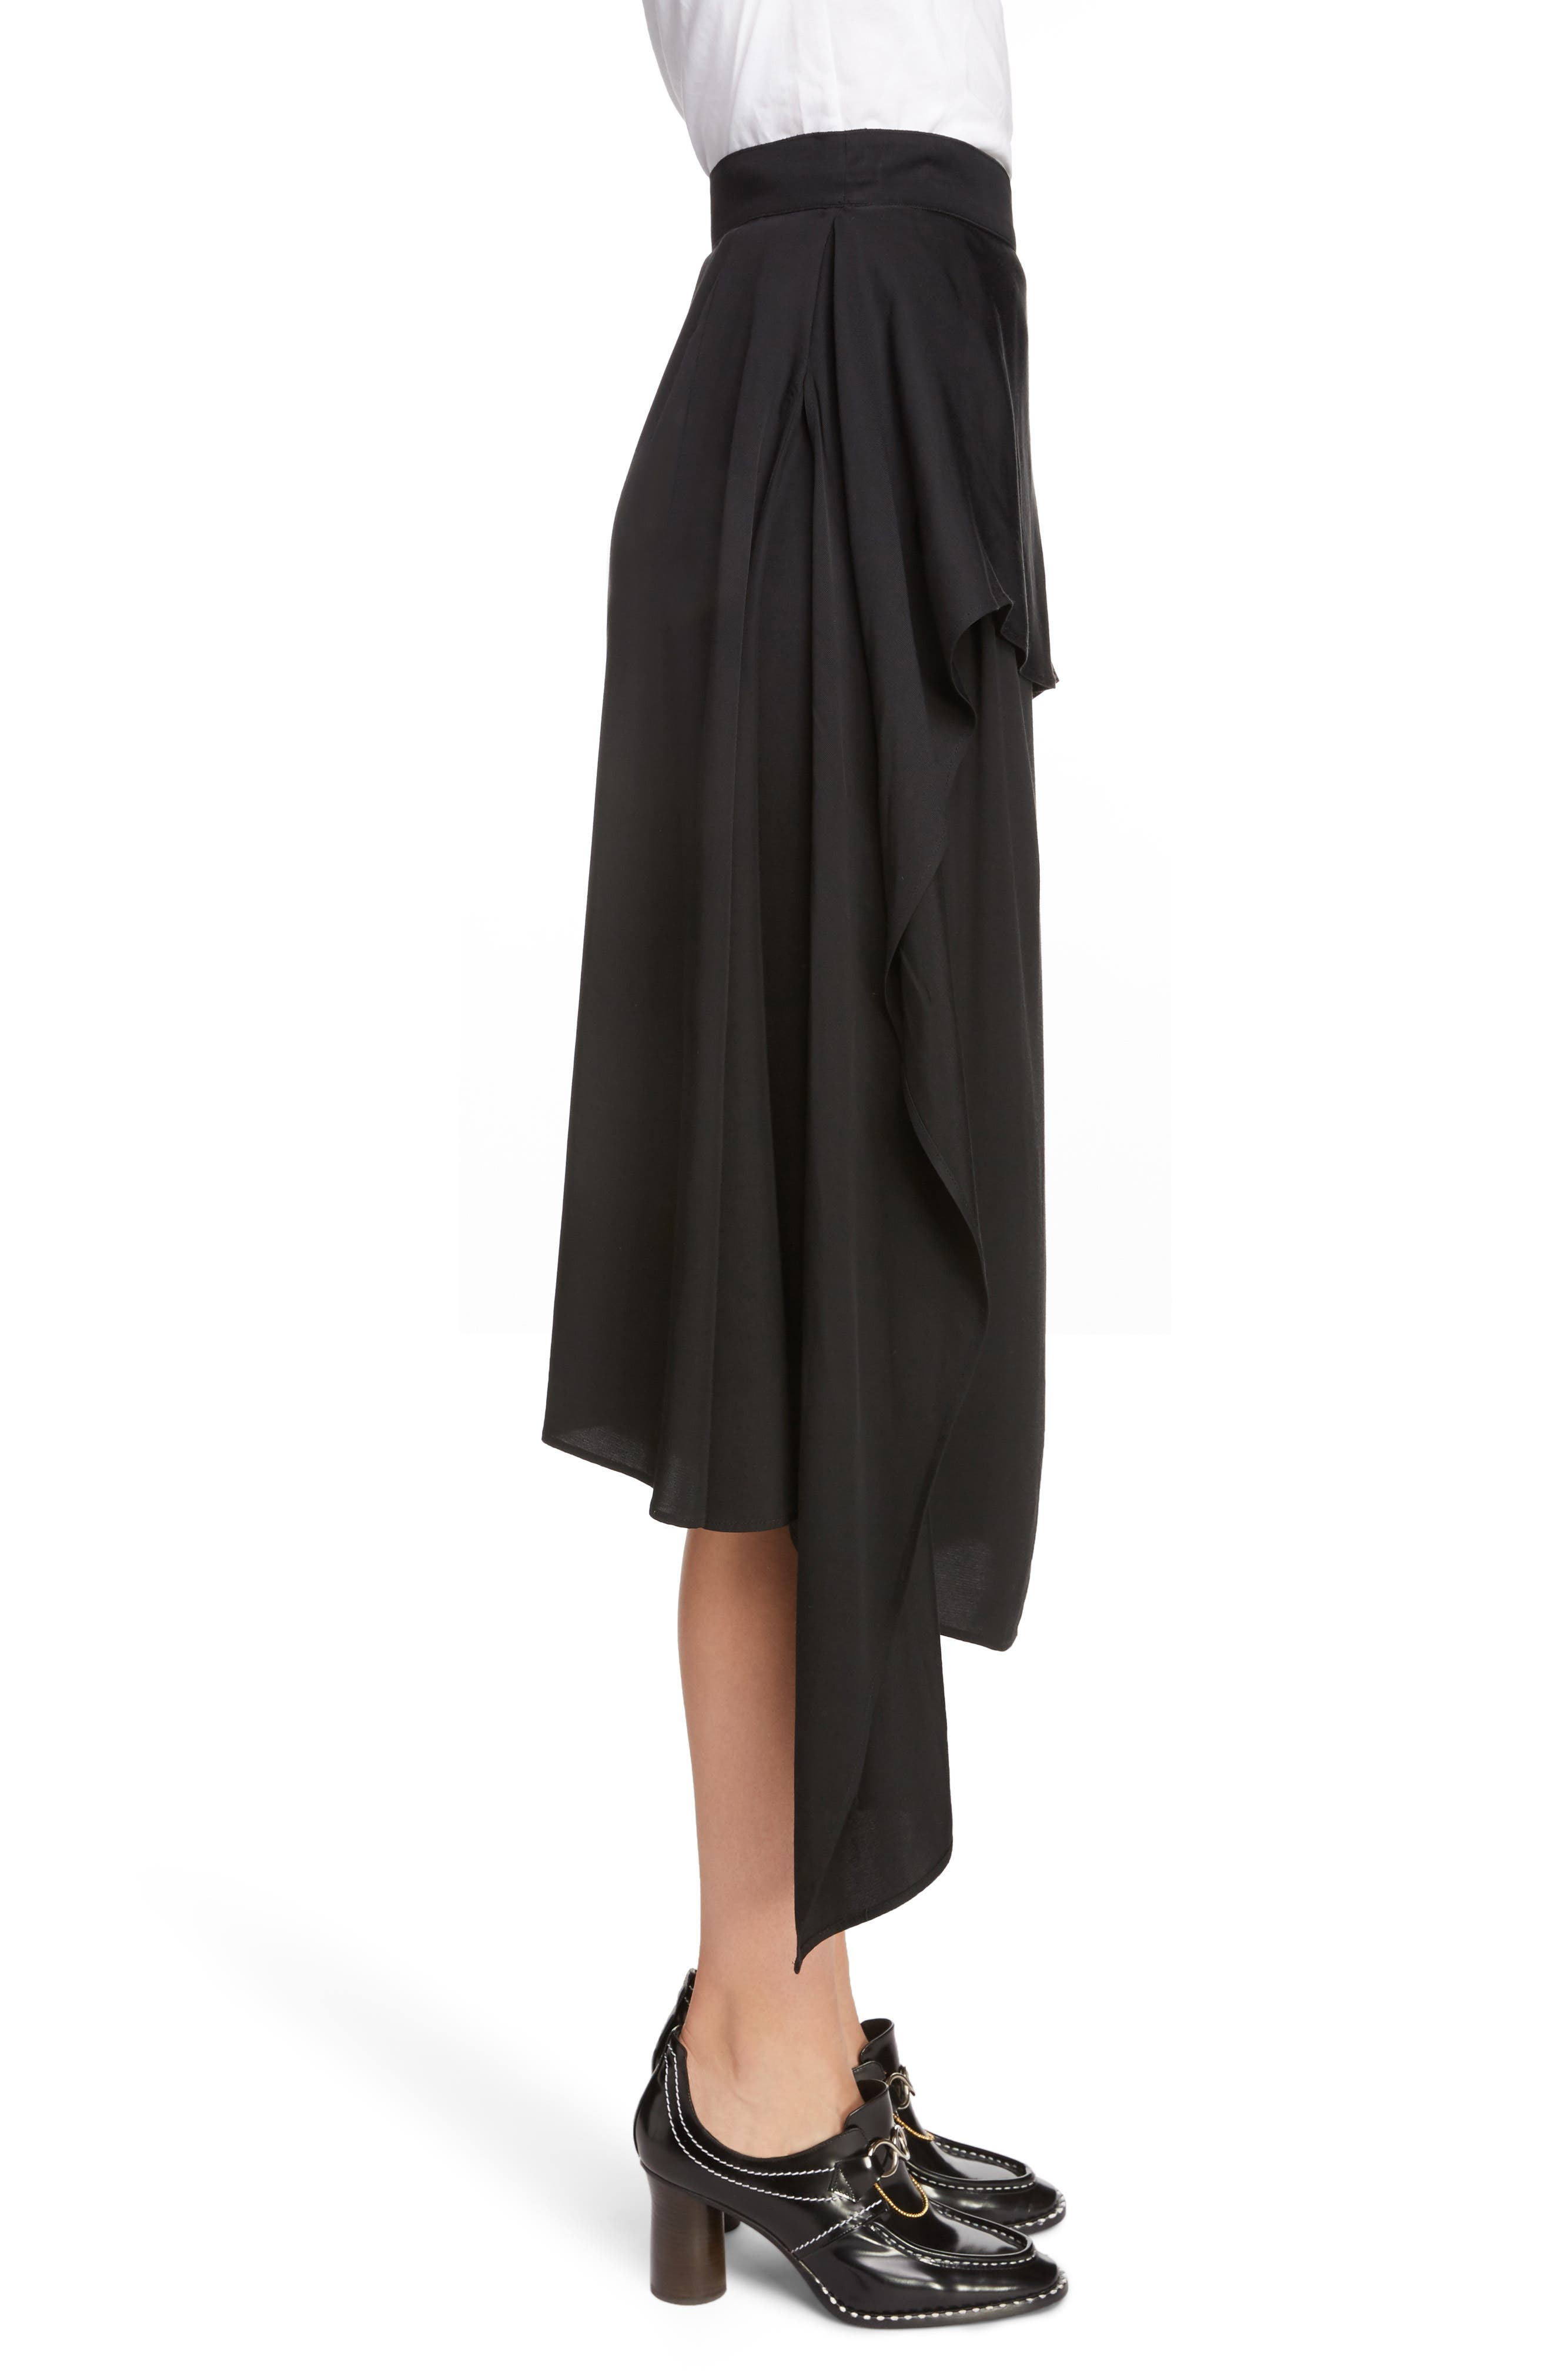 JW ANDERSON,                             Draped Side Asymmetrical Skirt,                             Alternate thumbnail 3, color,                             BLACK